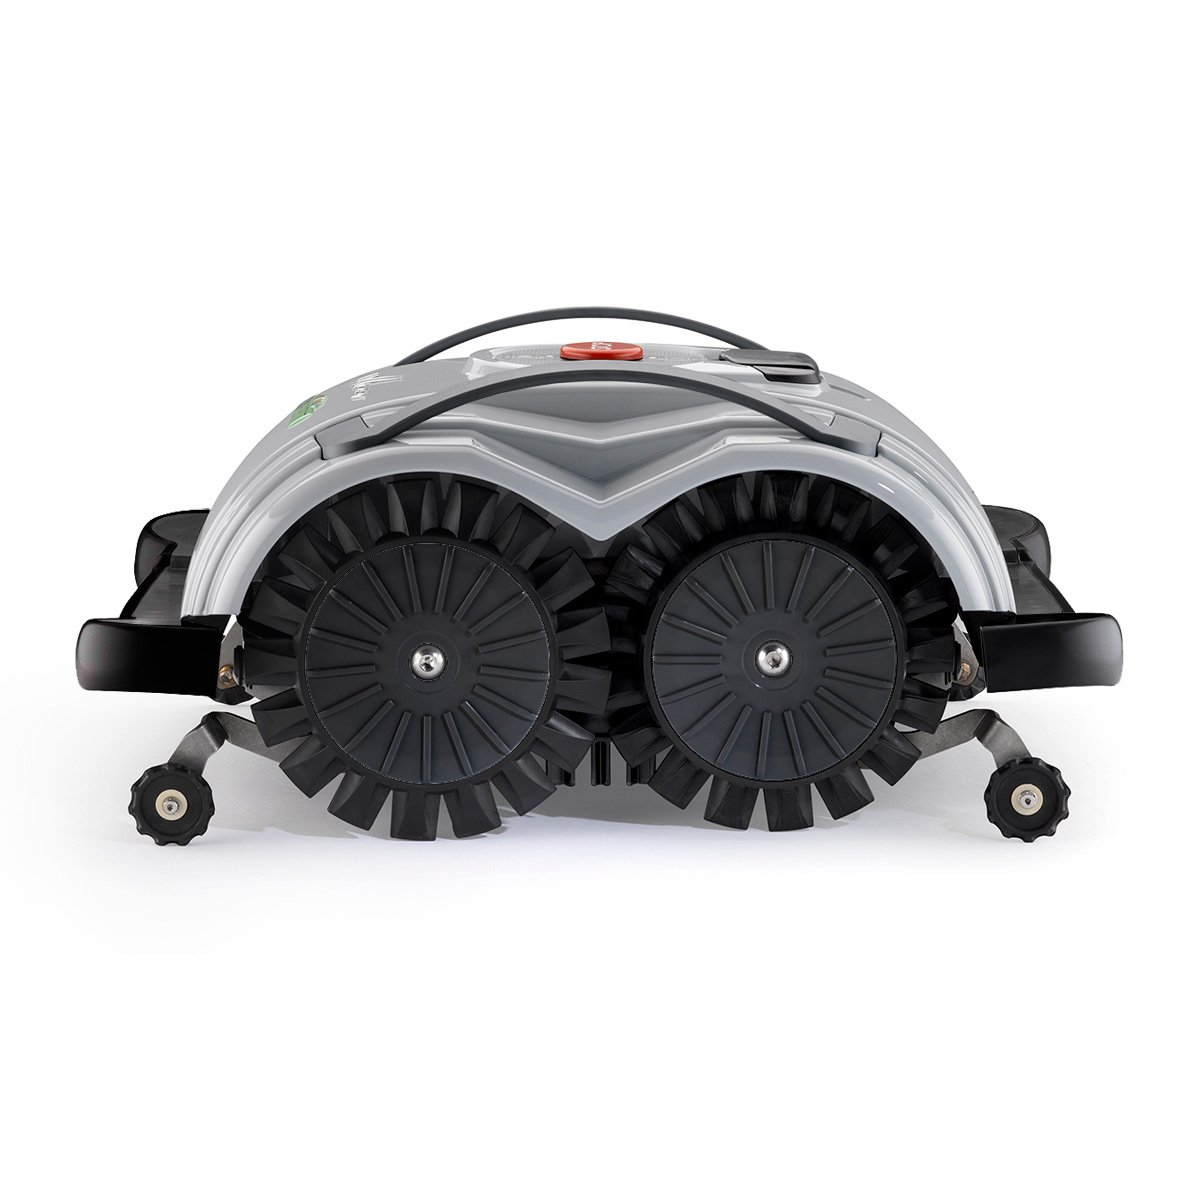 Mhroboter-Wiper-Blitz-X2-mit-Bluetooth-fr-ca-200-qm-Modell-2018